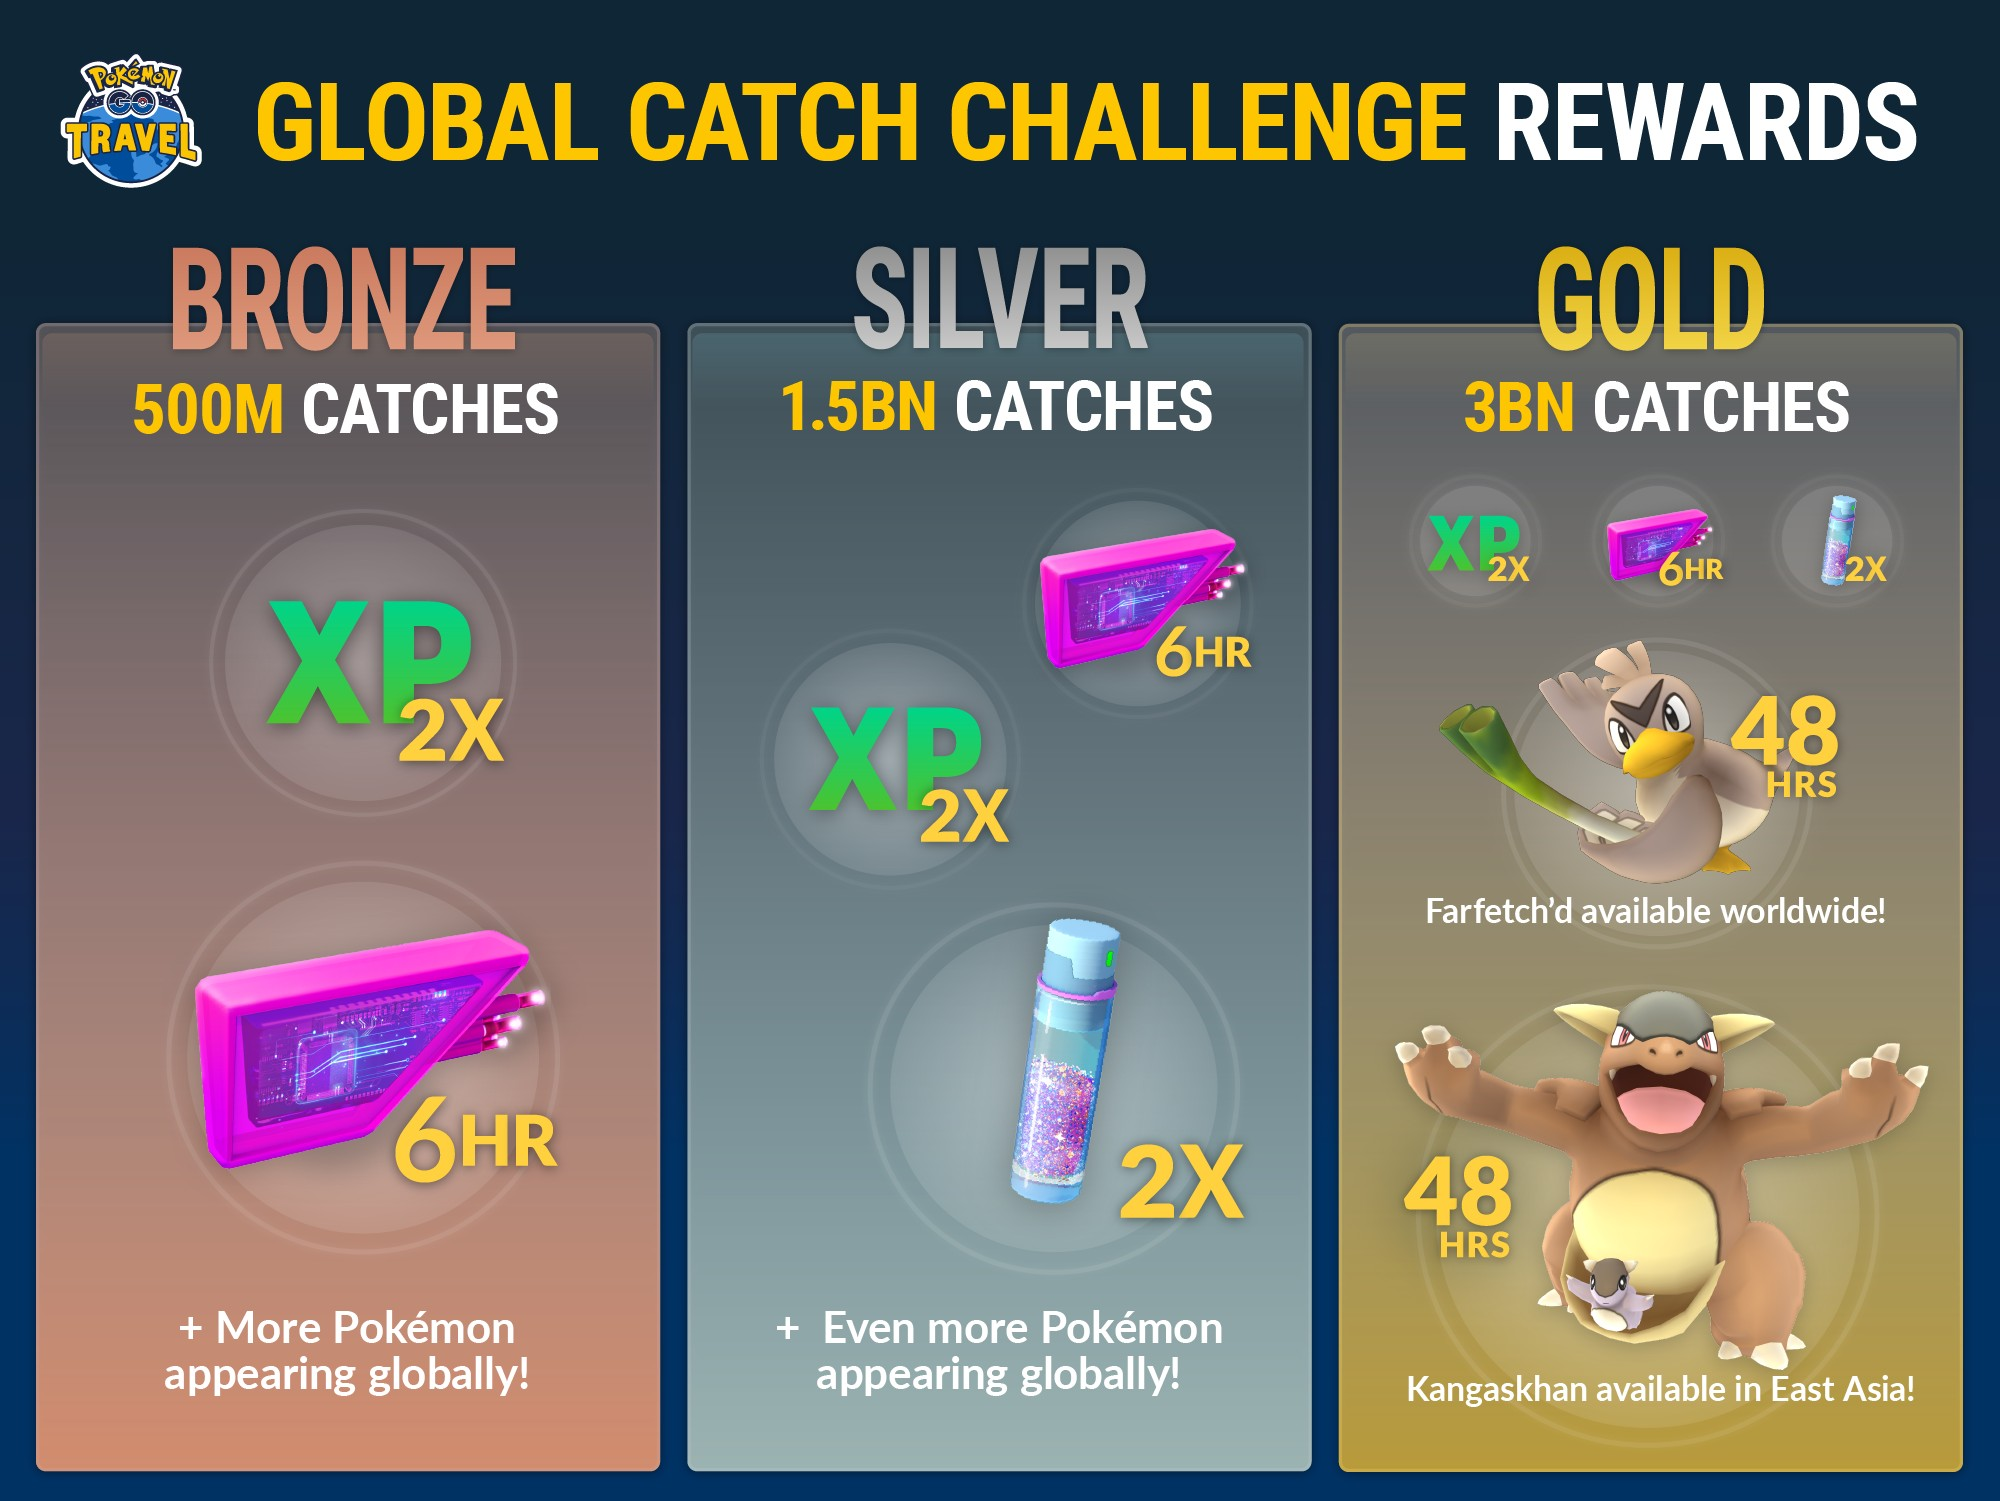 'Pokemon GO' Travel Kicks Off Global Catch Challenge, Better Catch 3 Billion Pokemon